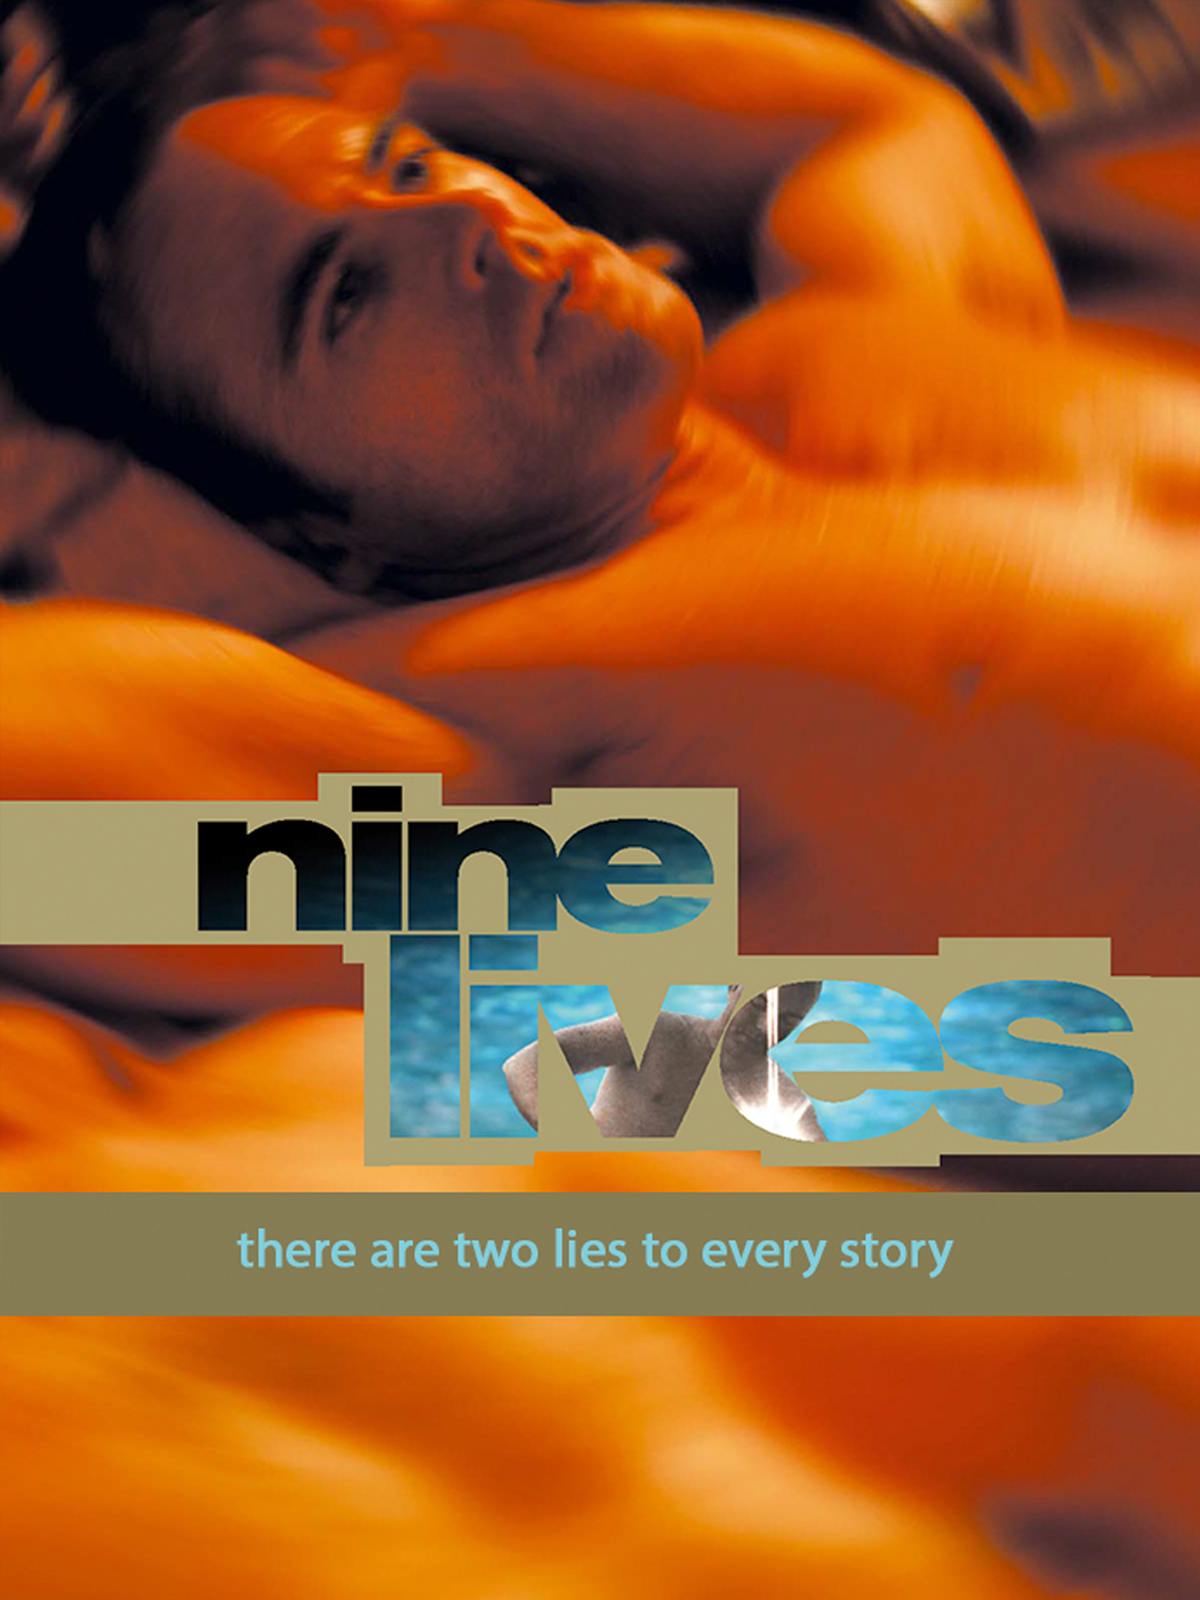 Here-NineLives-Full-Image-en-US.jpg